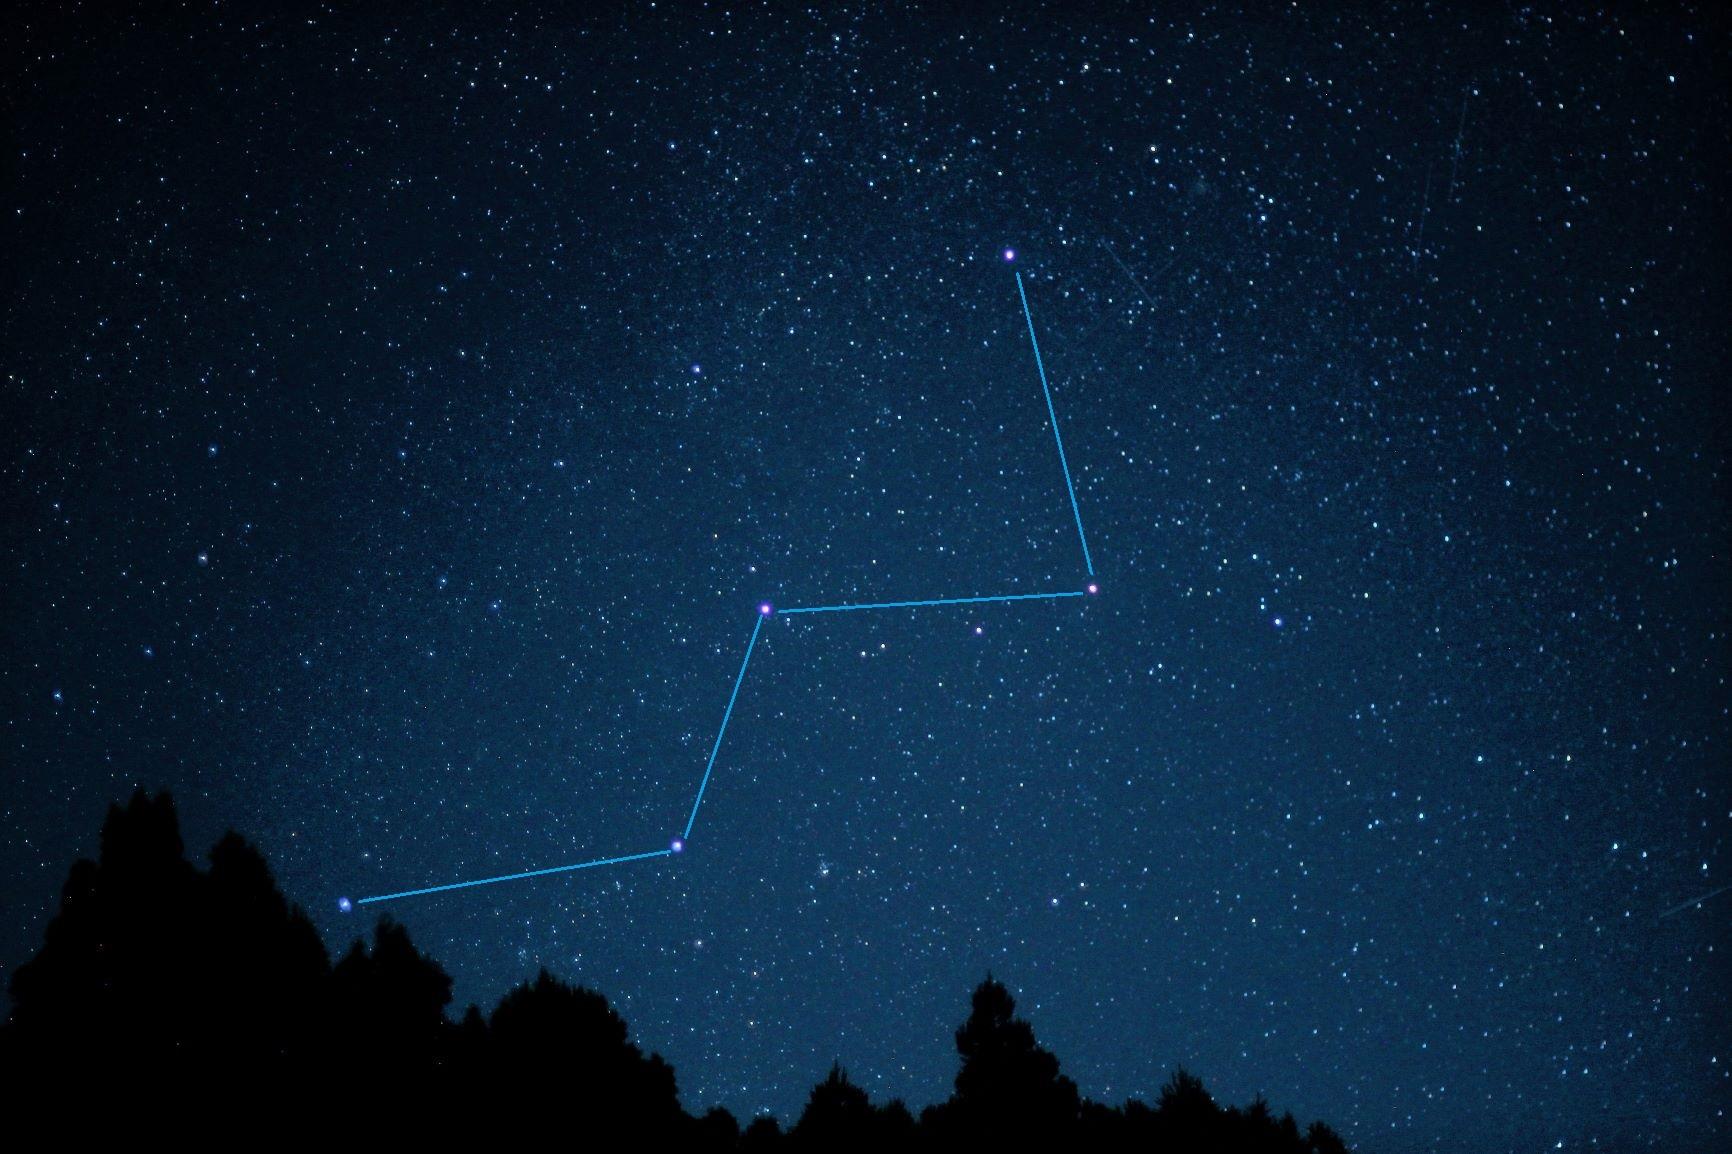 夏休みの自由研究2020 星空観察②_d0155147_11373460.jpg